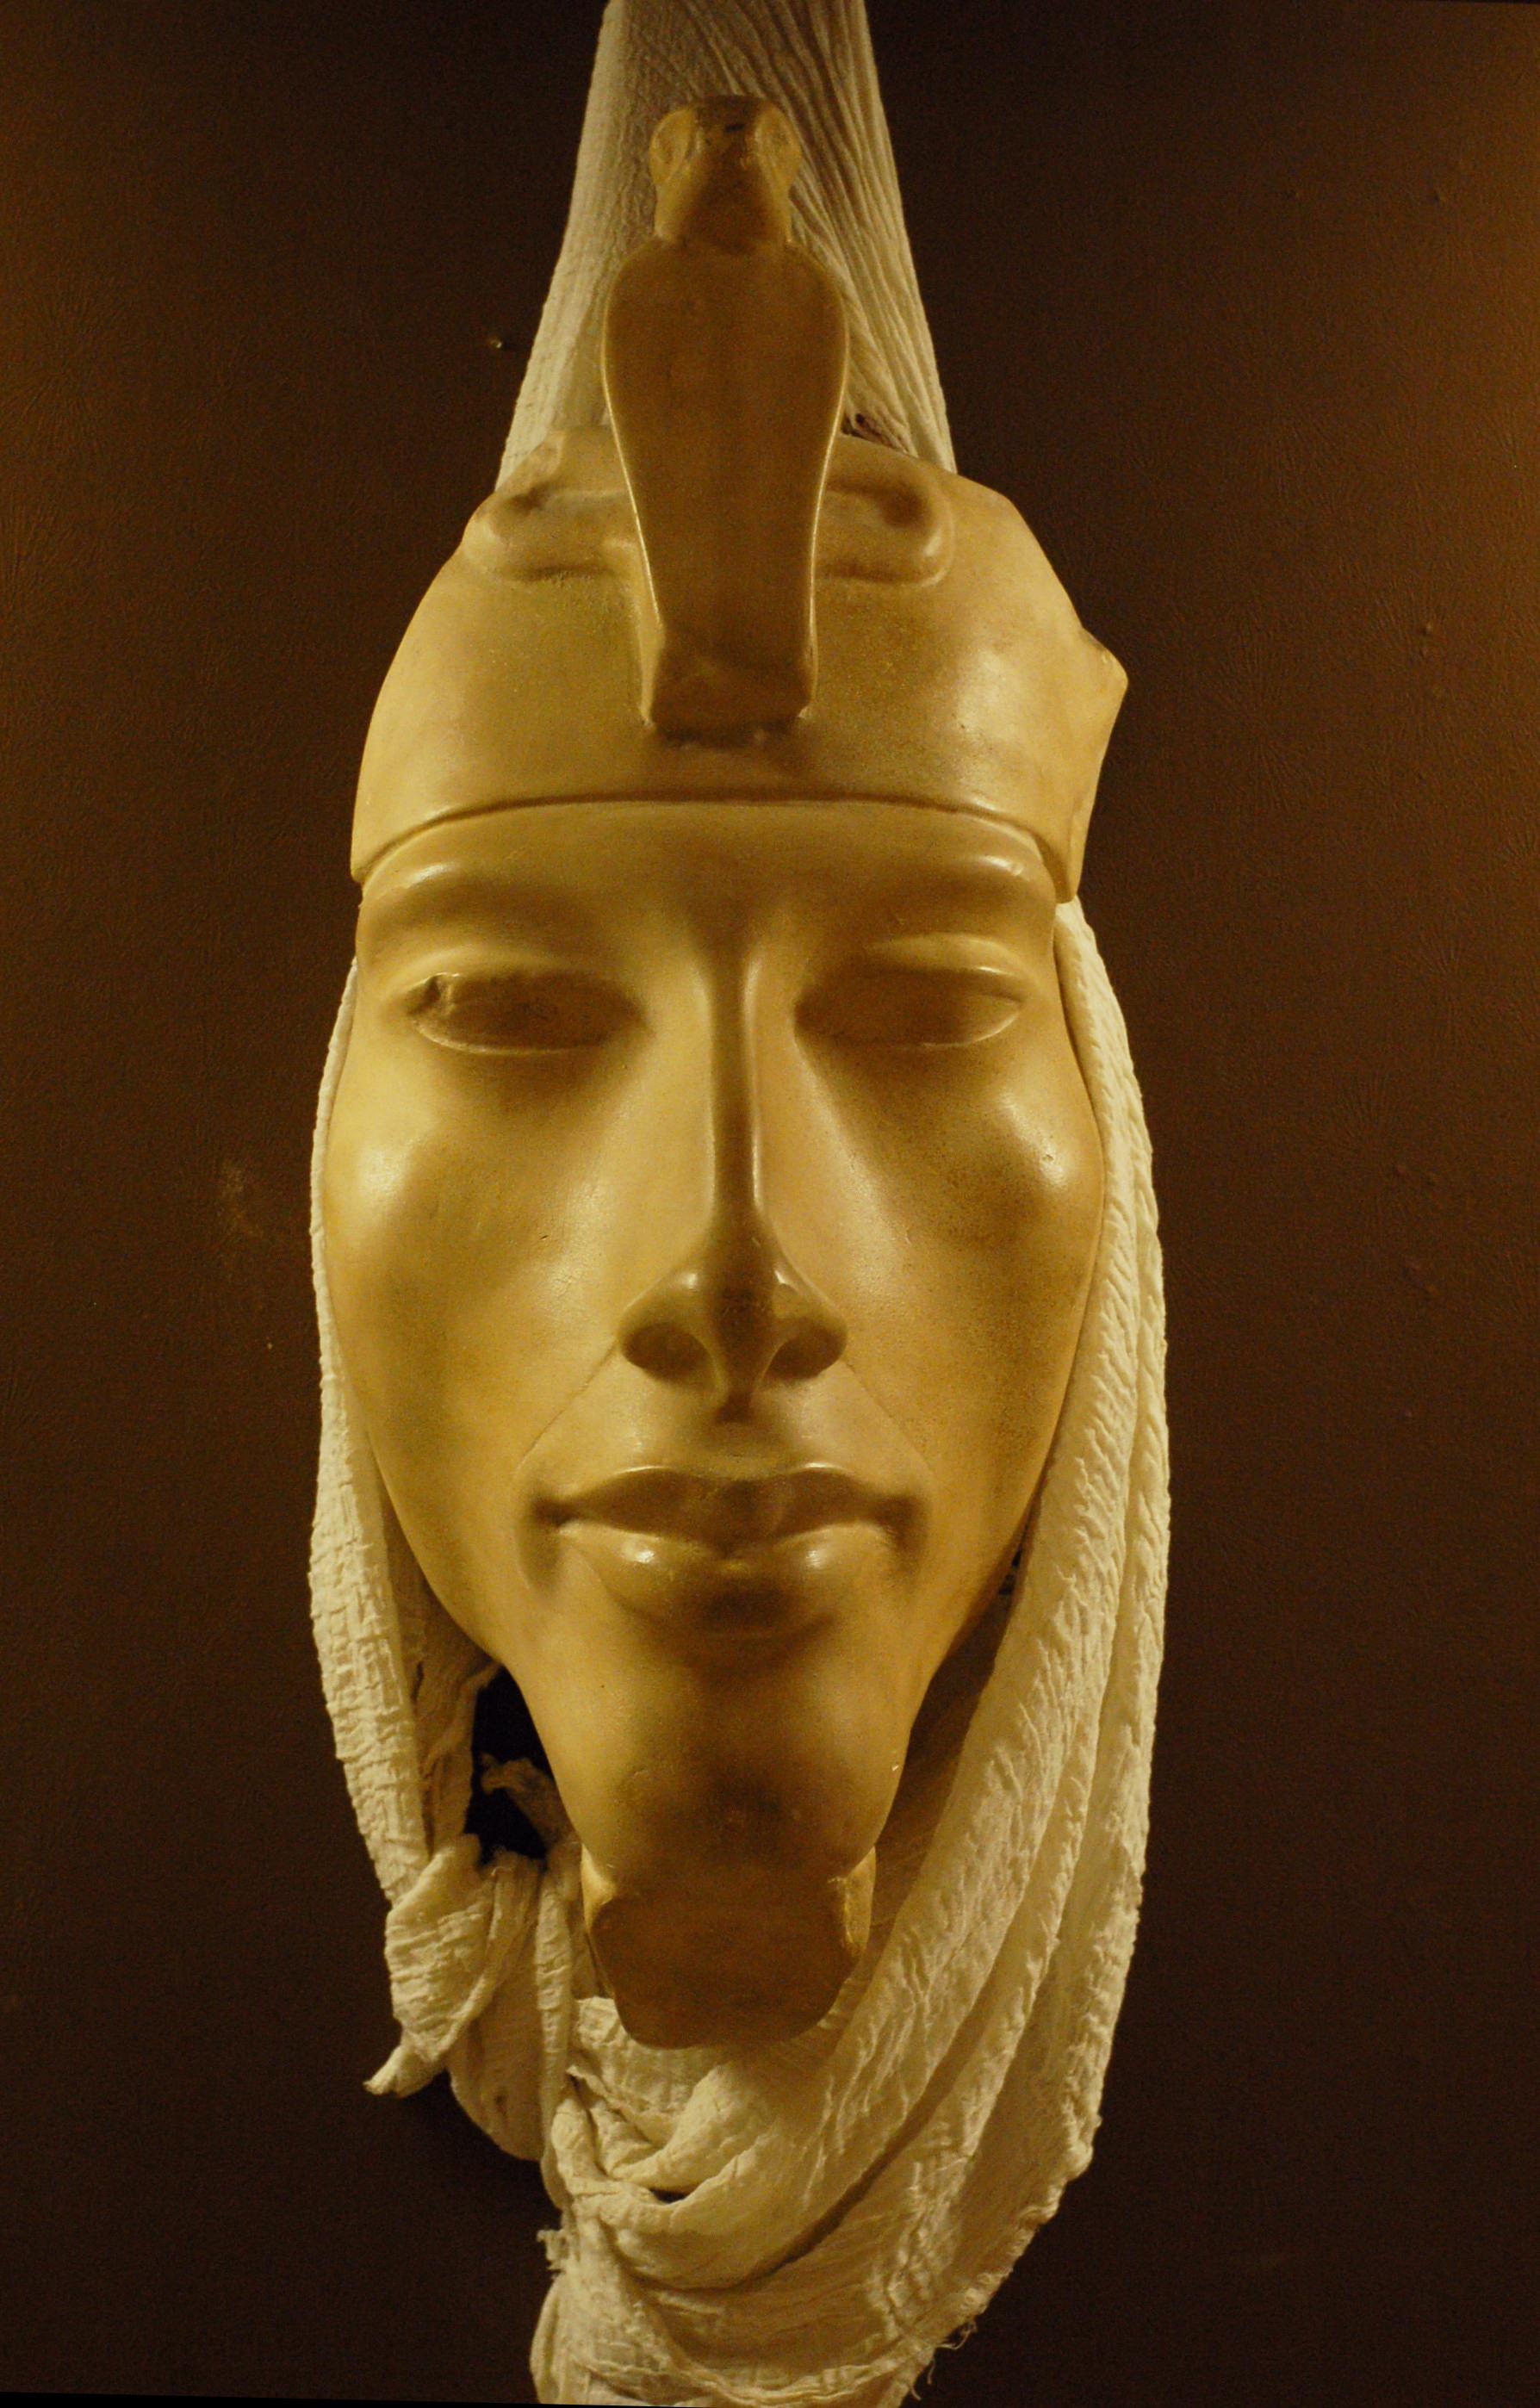 http://upload.wikimedia.org/wikipedia/commons/f/fd/EMS-92205-Rosicrucian-Egyptian-Akhenaten.JPG